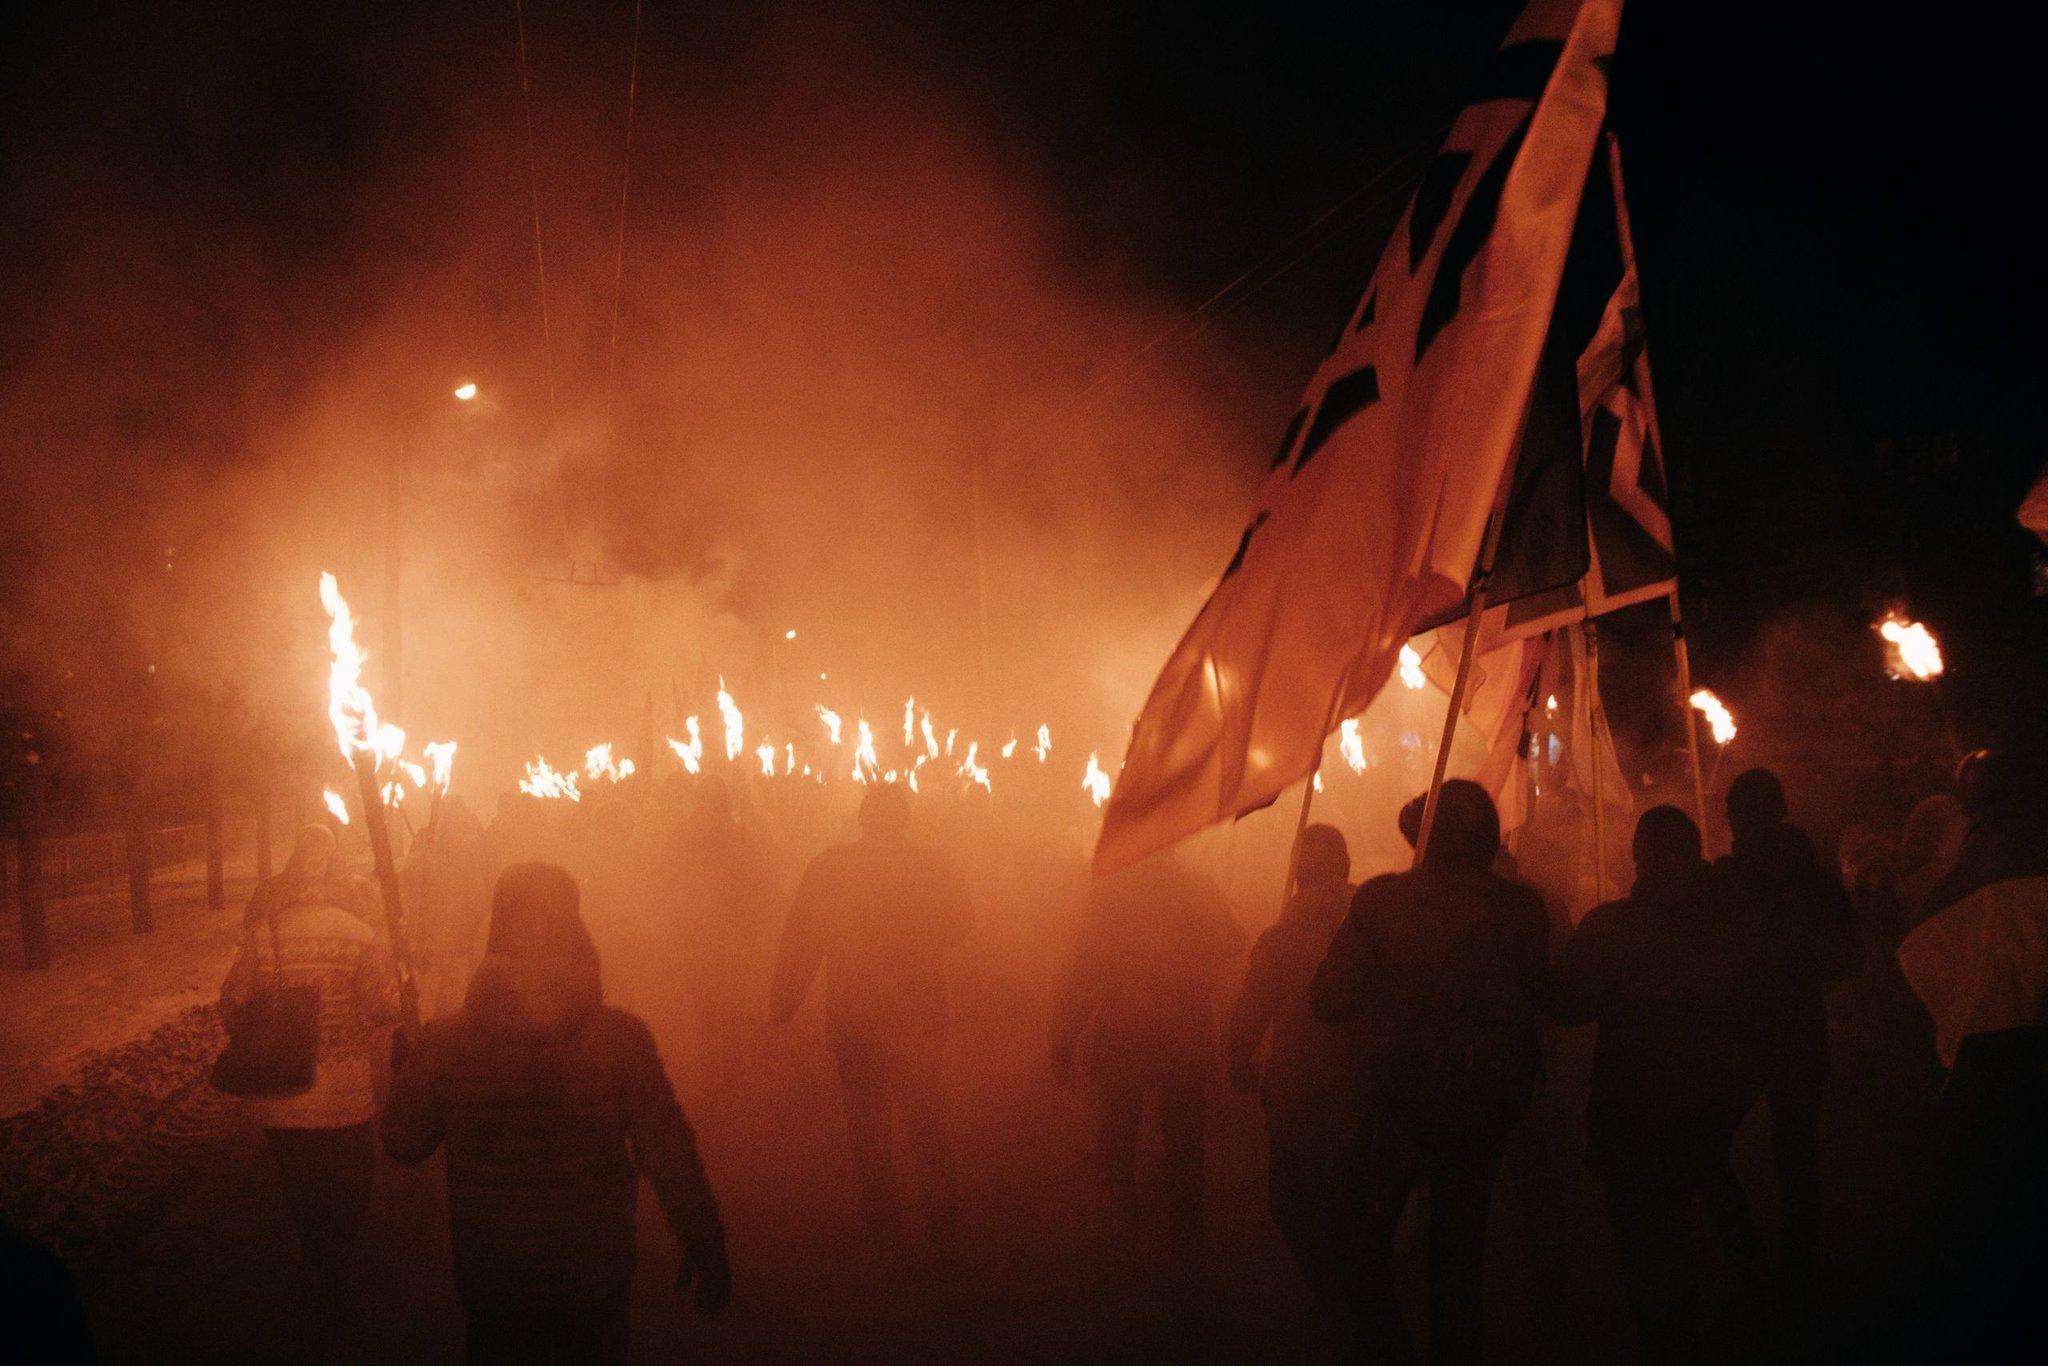 Факельное шествие на Украине, автор: spoilt.exile [spoilt_exile], лицензия: CC BY SA 2.0